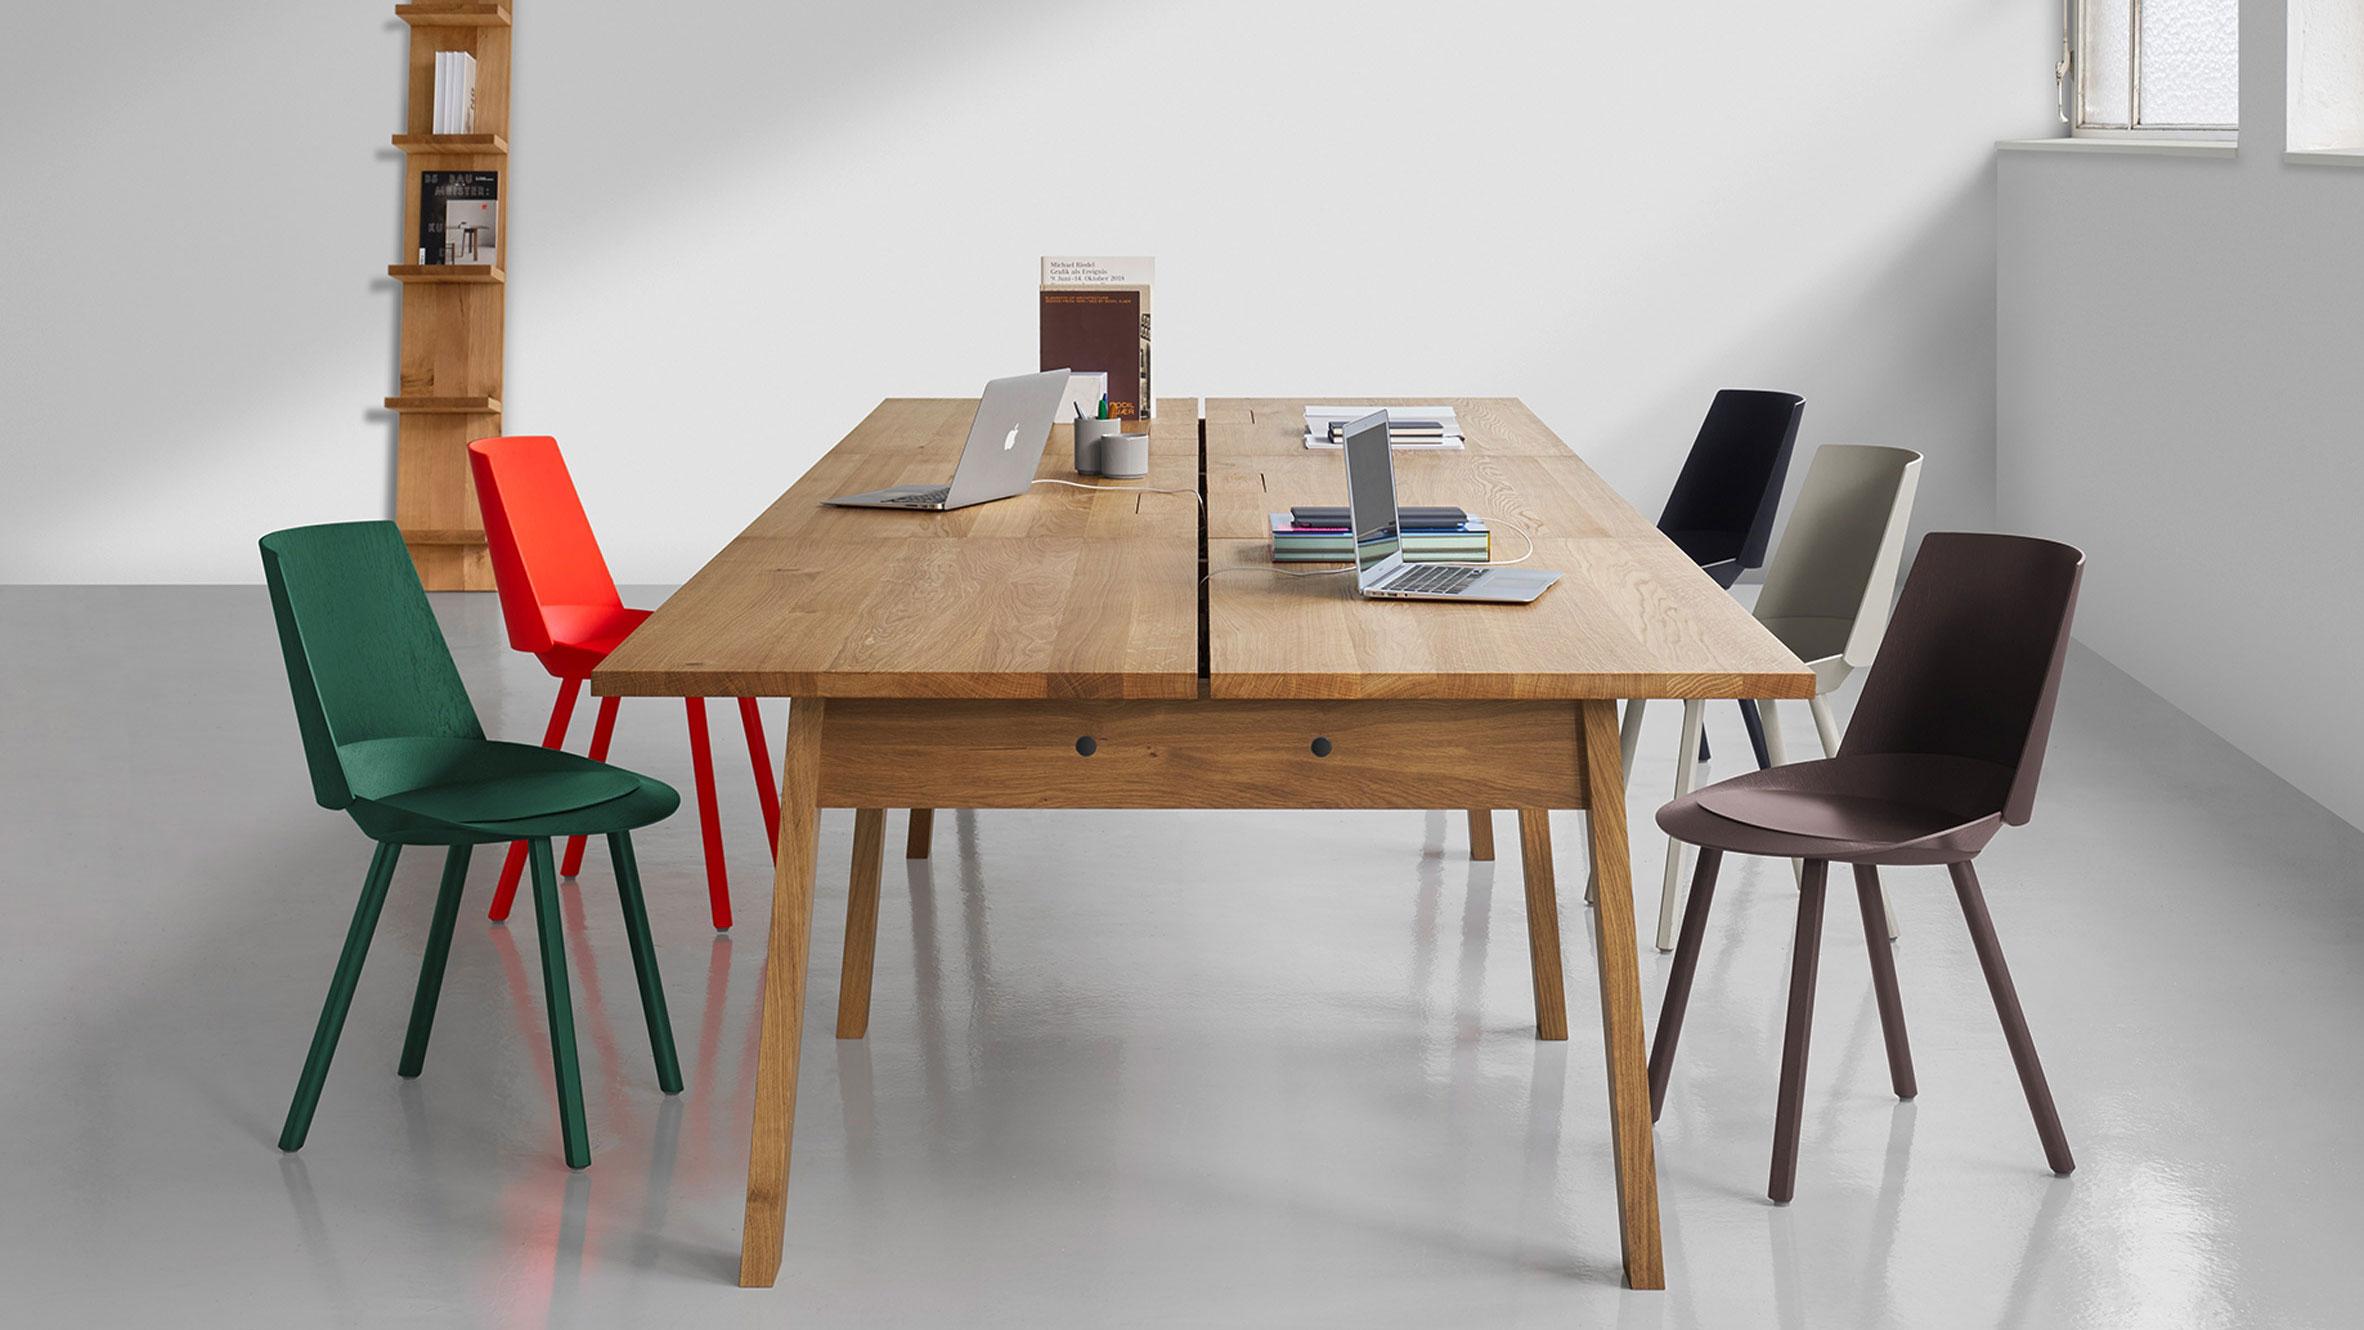 Junior Furniture Designer At The Interior S House In London Uk